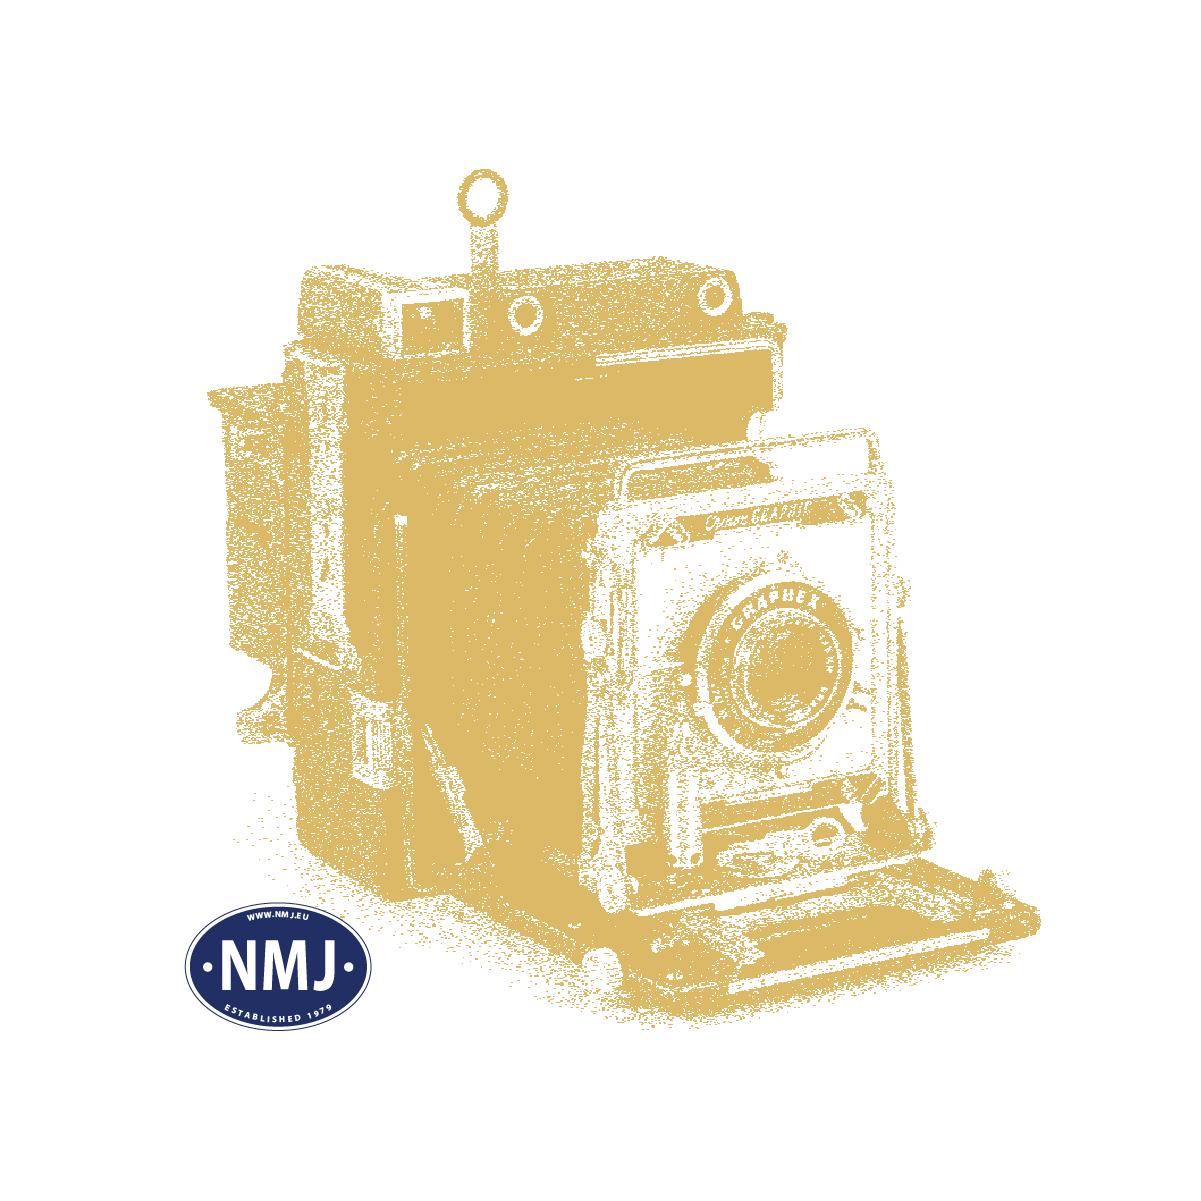 "NMJT81.103AC - NMJ Topline GMB Flotoget BM71 ""Edvard Munch"", AC"